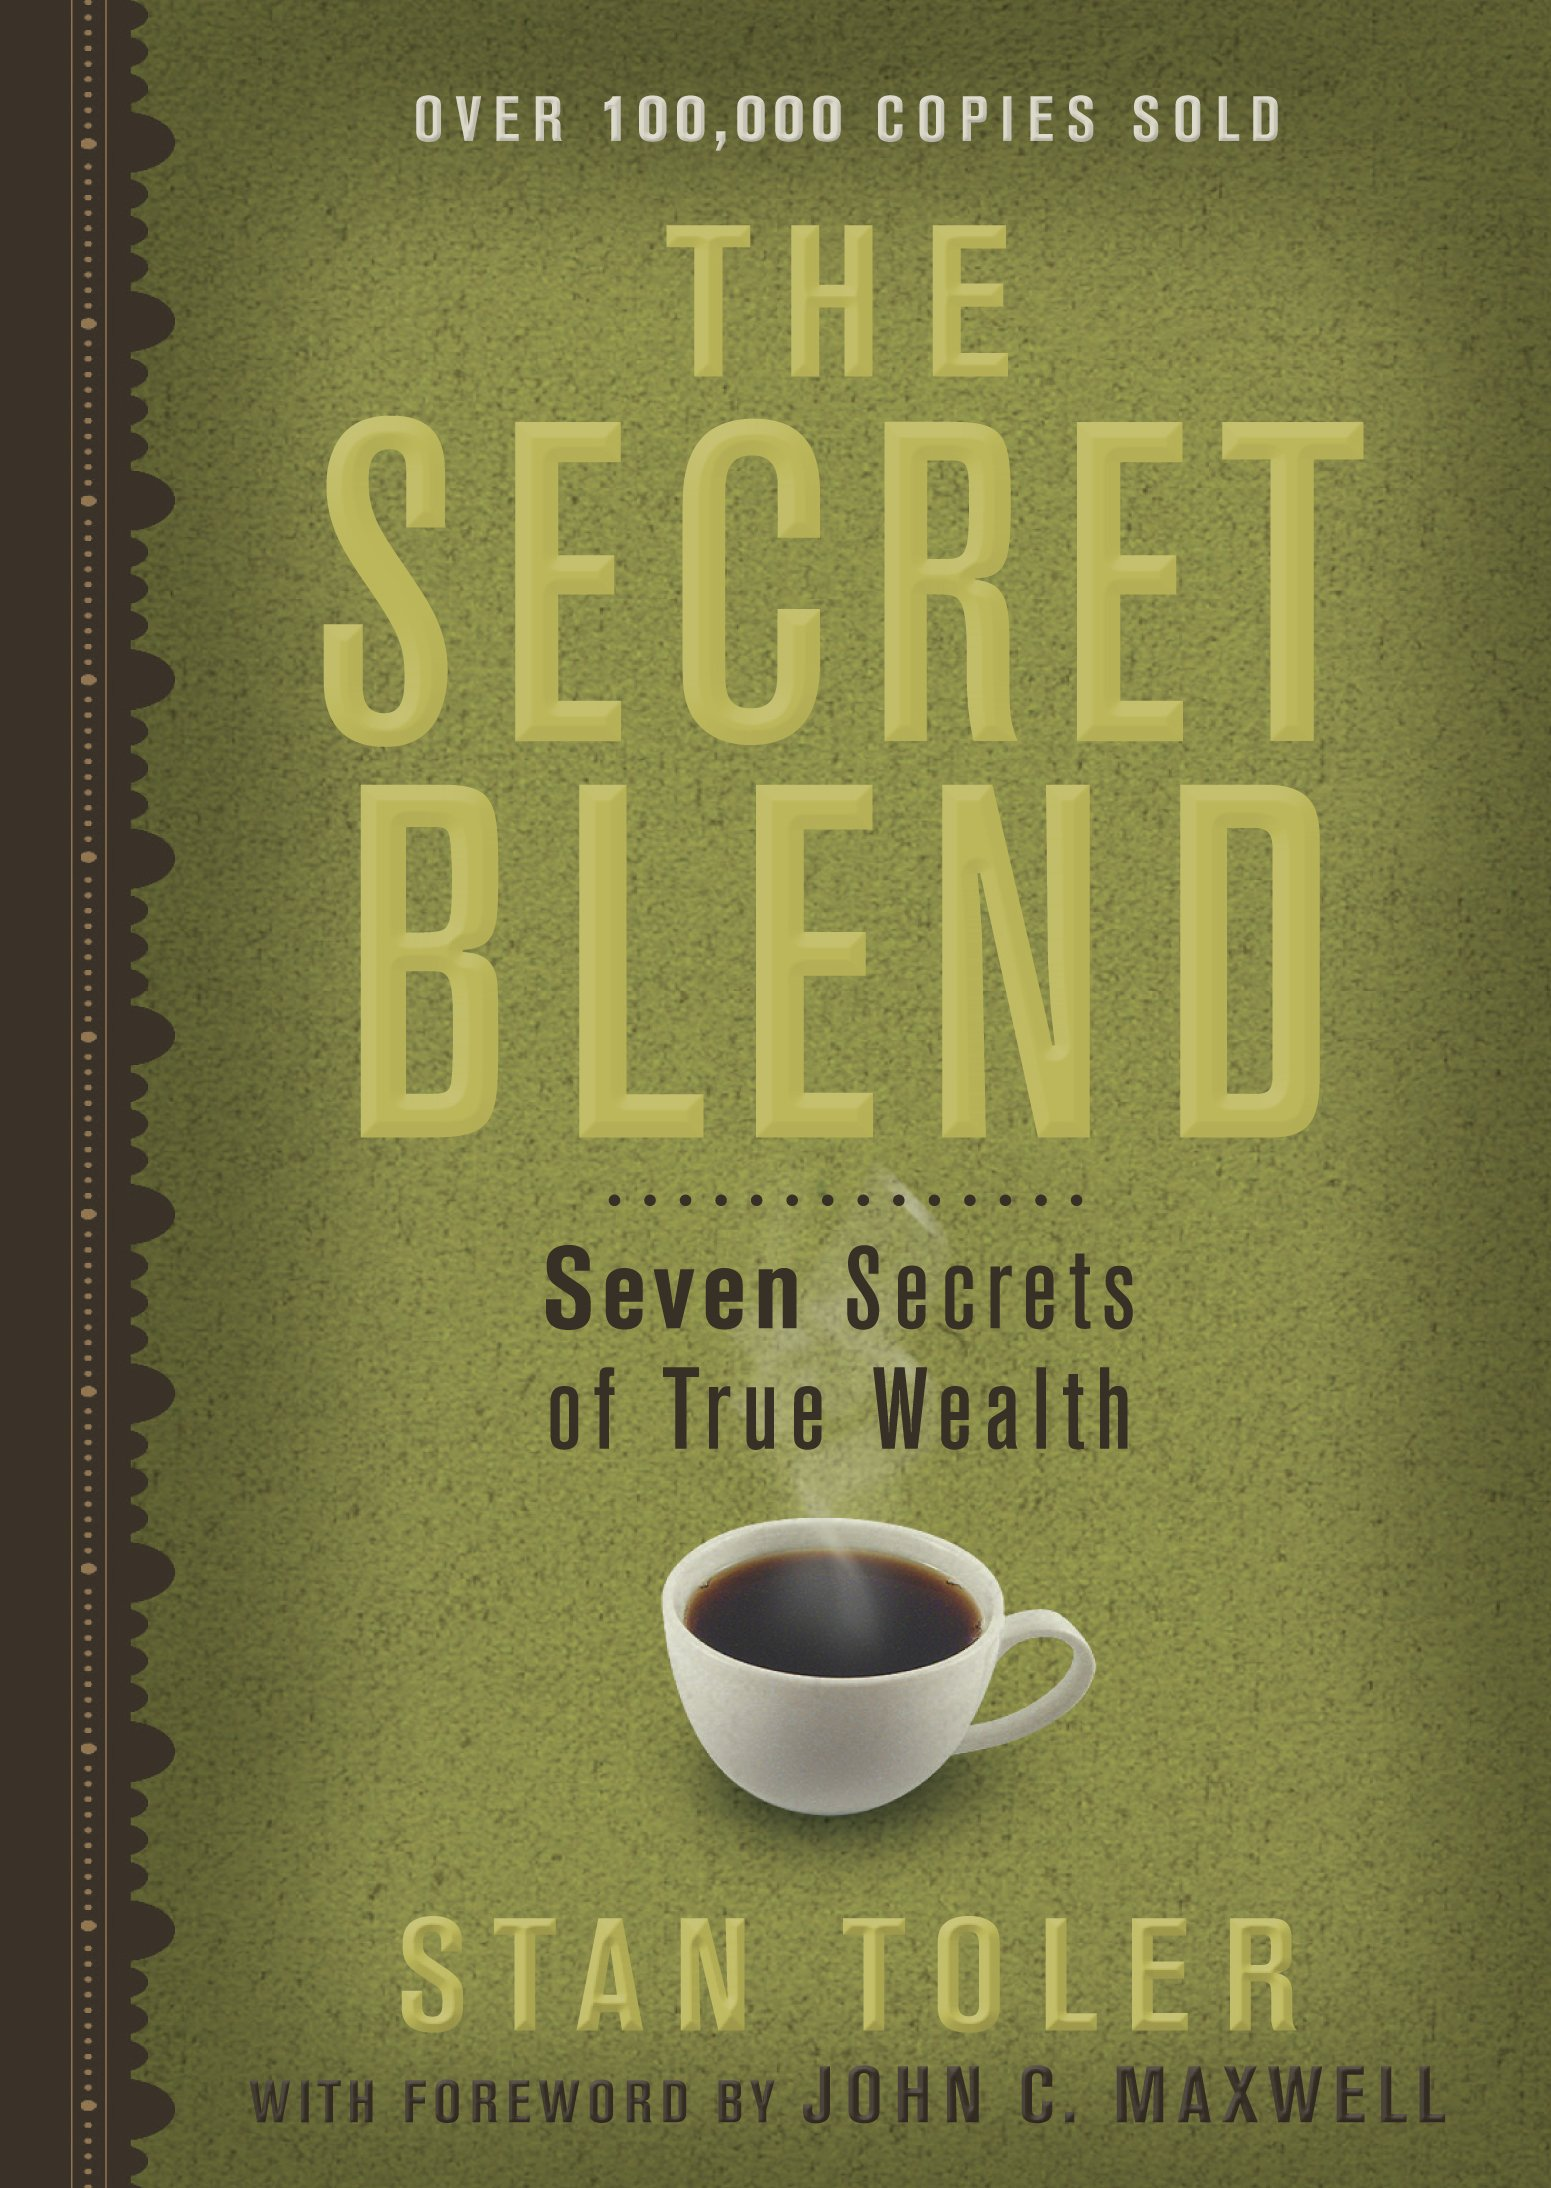 The Secret Blend: Seven Secrets of True Wealth pdf